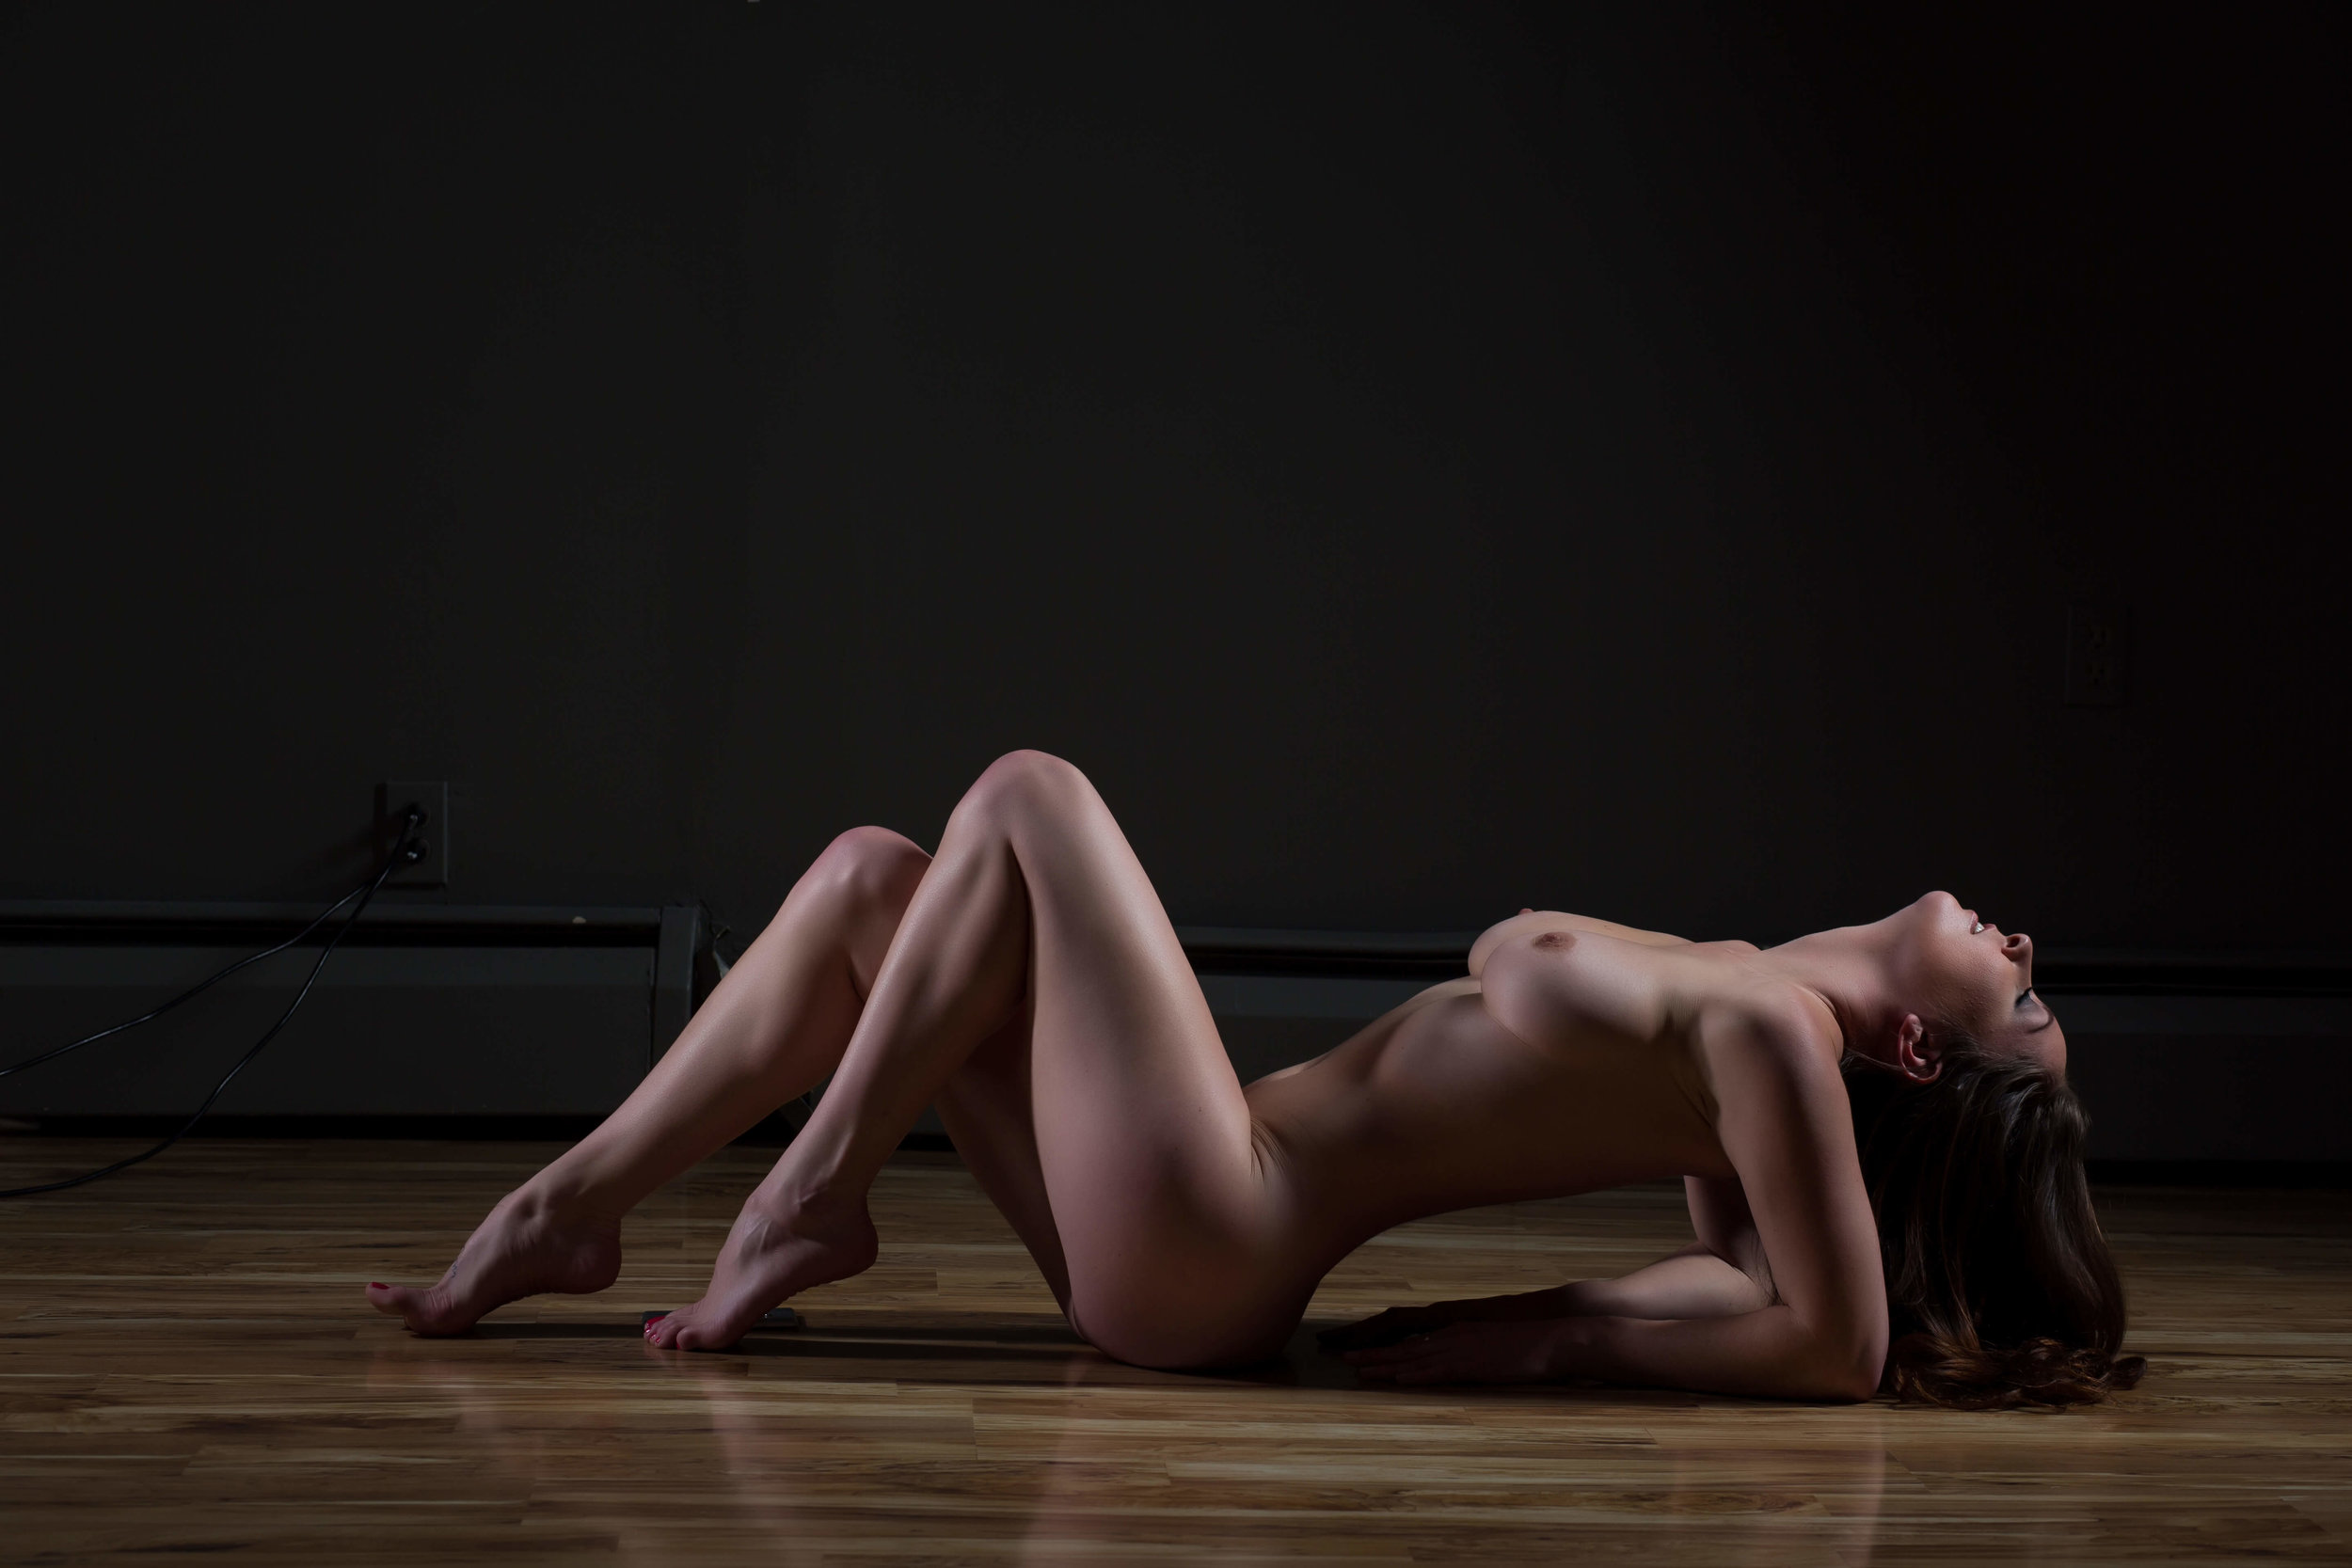 nude-vixen-03.jpg